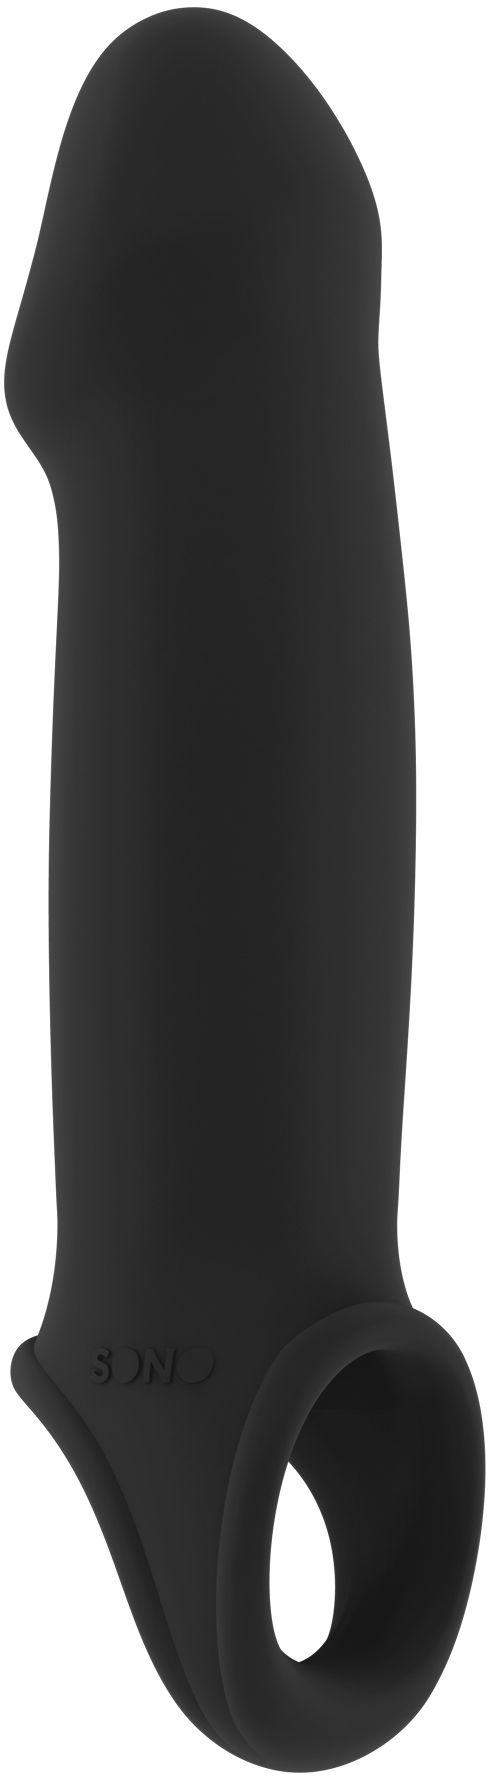 Sono No.33 Stretchy Penis Extension Black